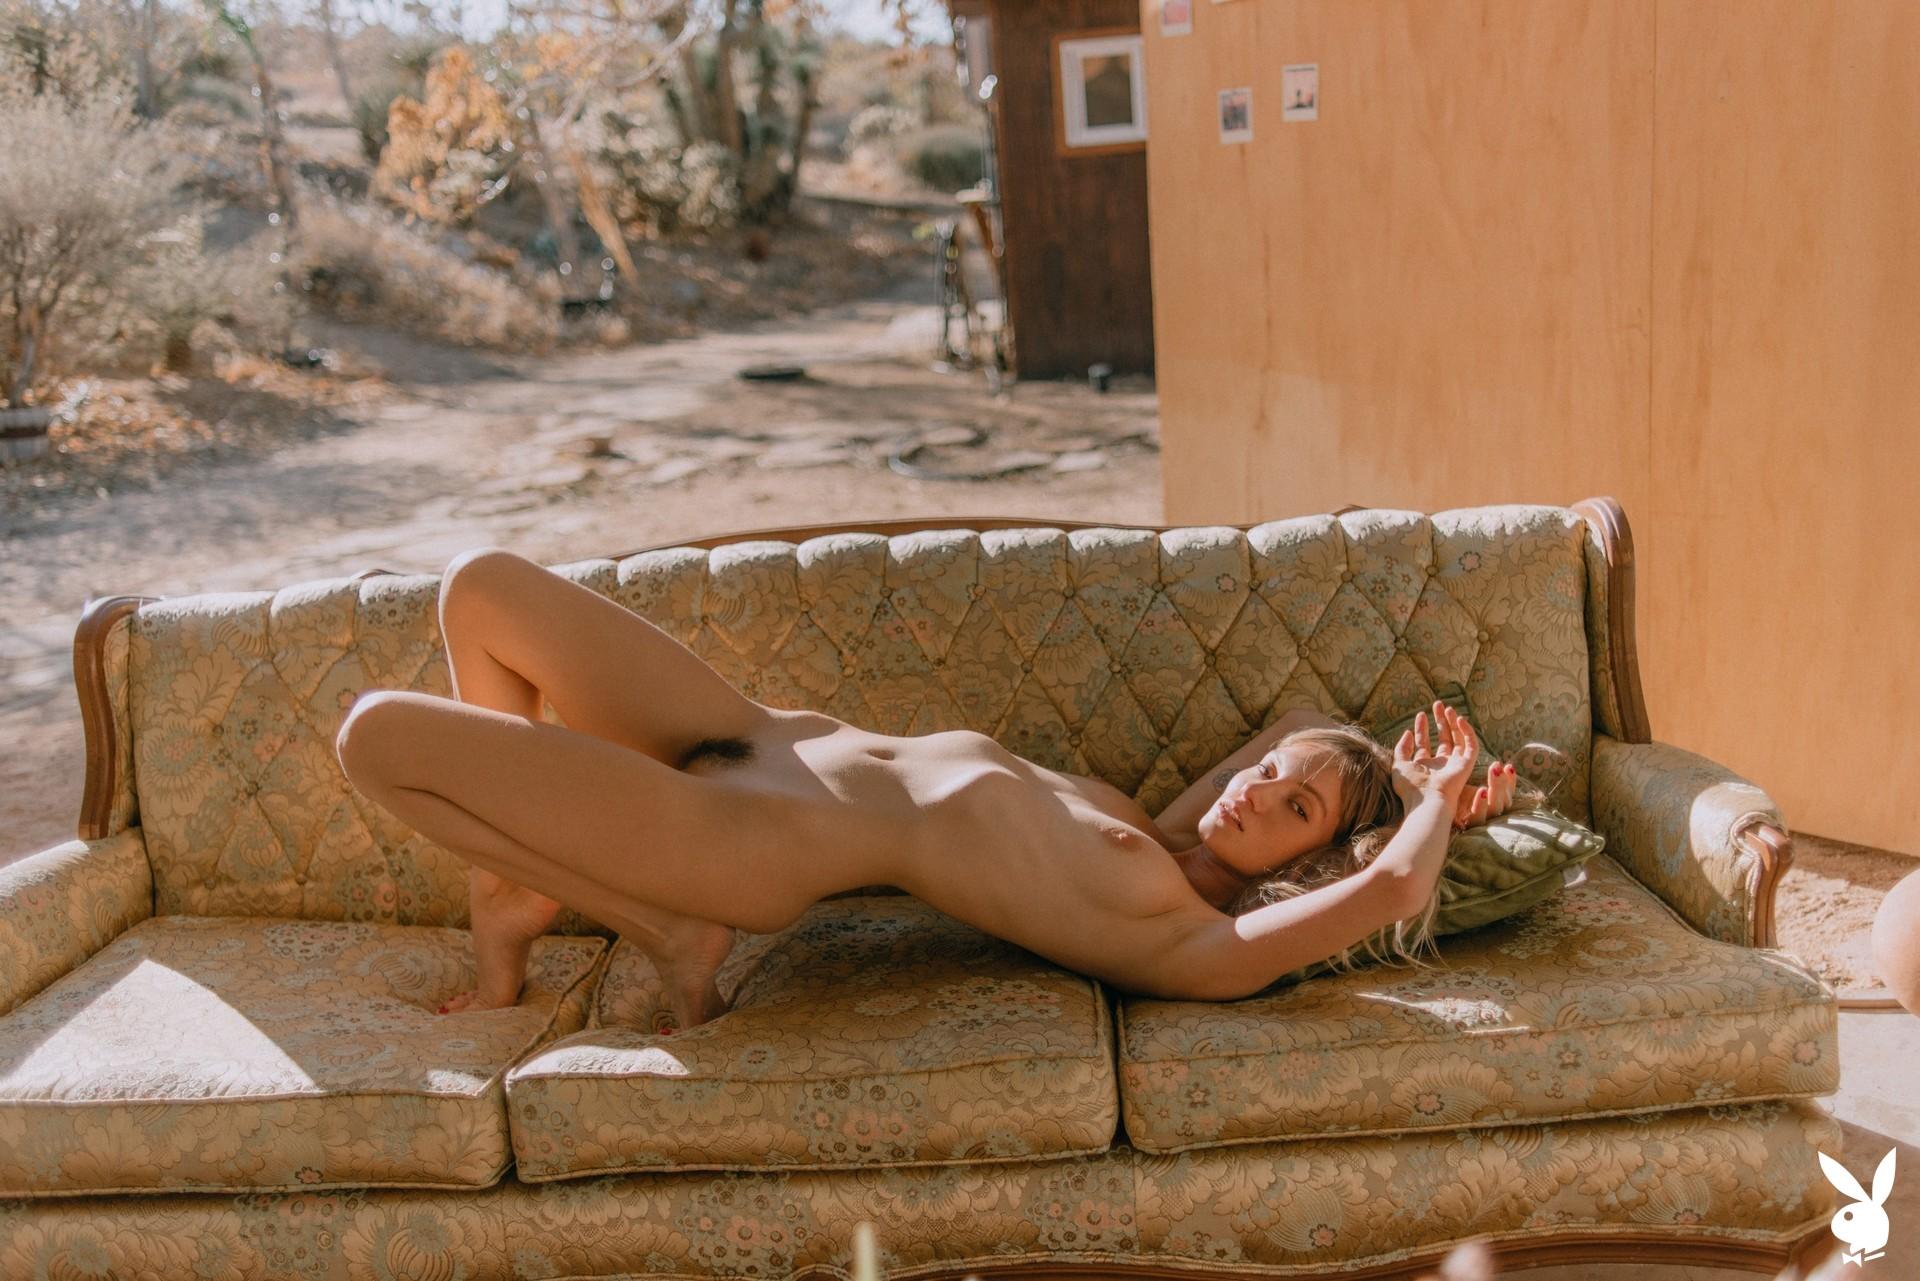 Nastasia Celeste In Creative Space Playboy Plus (34)